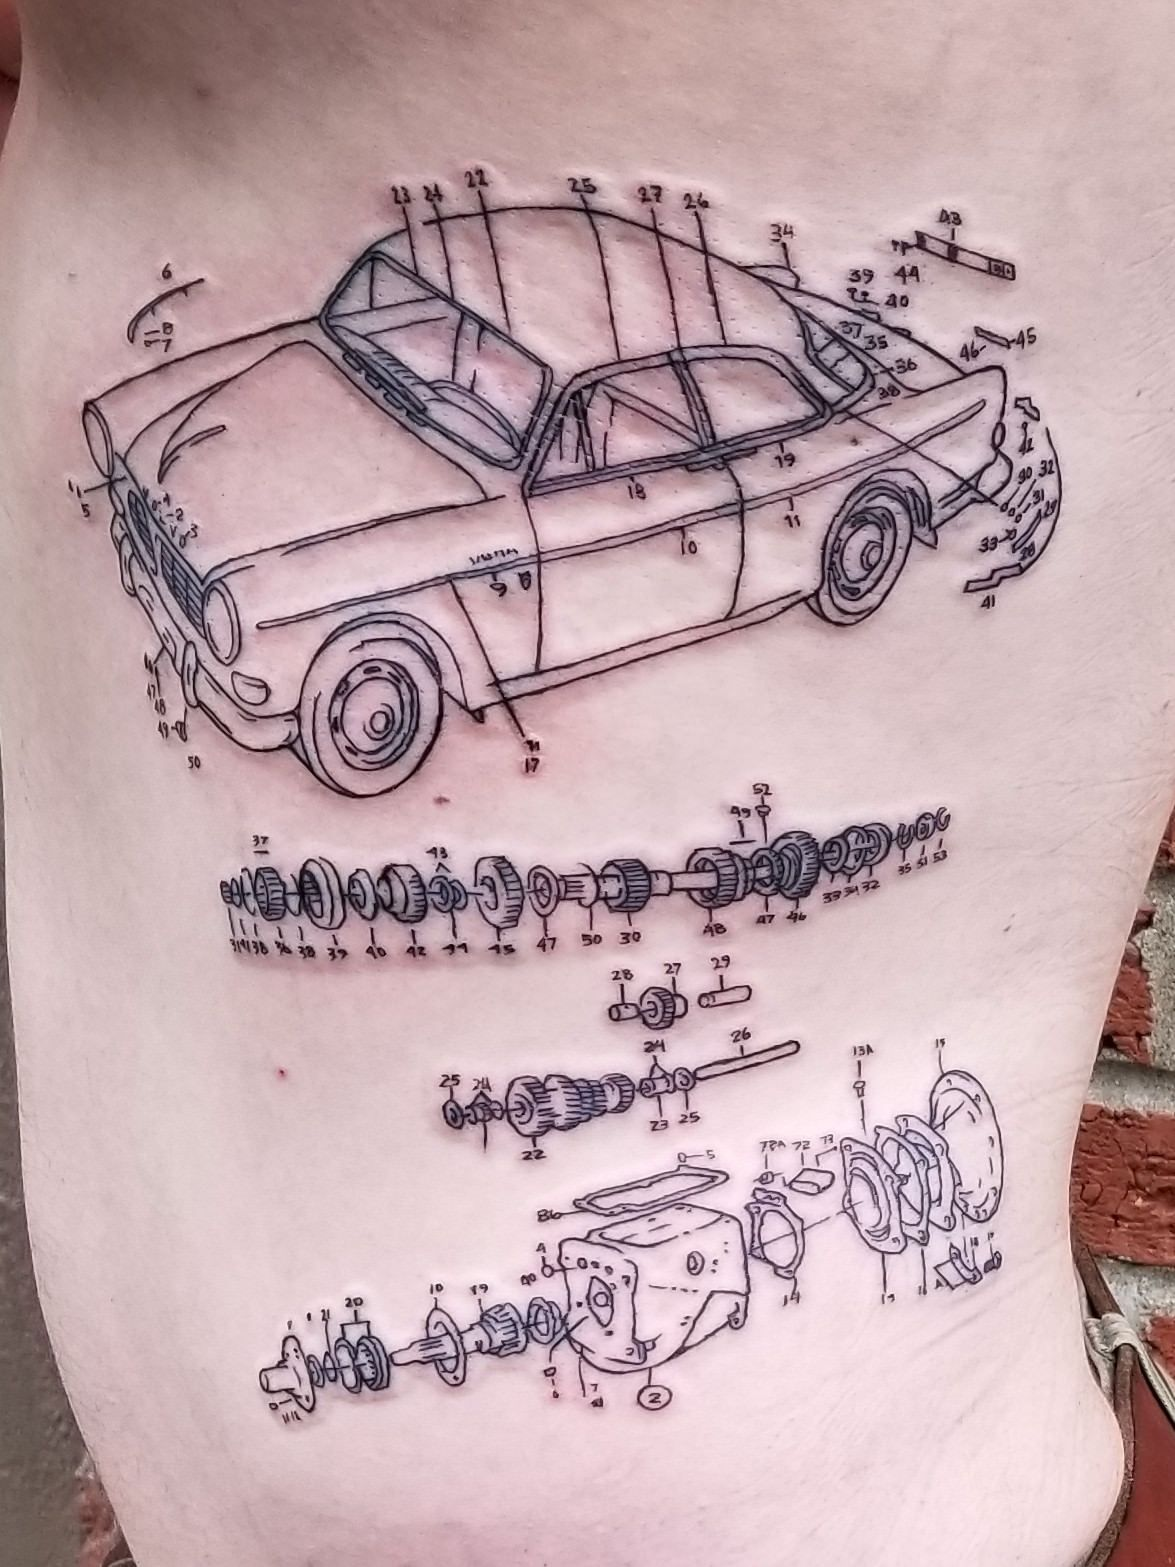 Seth At True Love Art Gallery Tattoo In Seattle Volvo 122 And Gearbox Tattoo 2 Tattoos Mechanic Tattoo Dad Tattoos